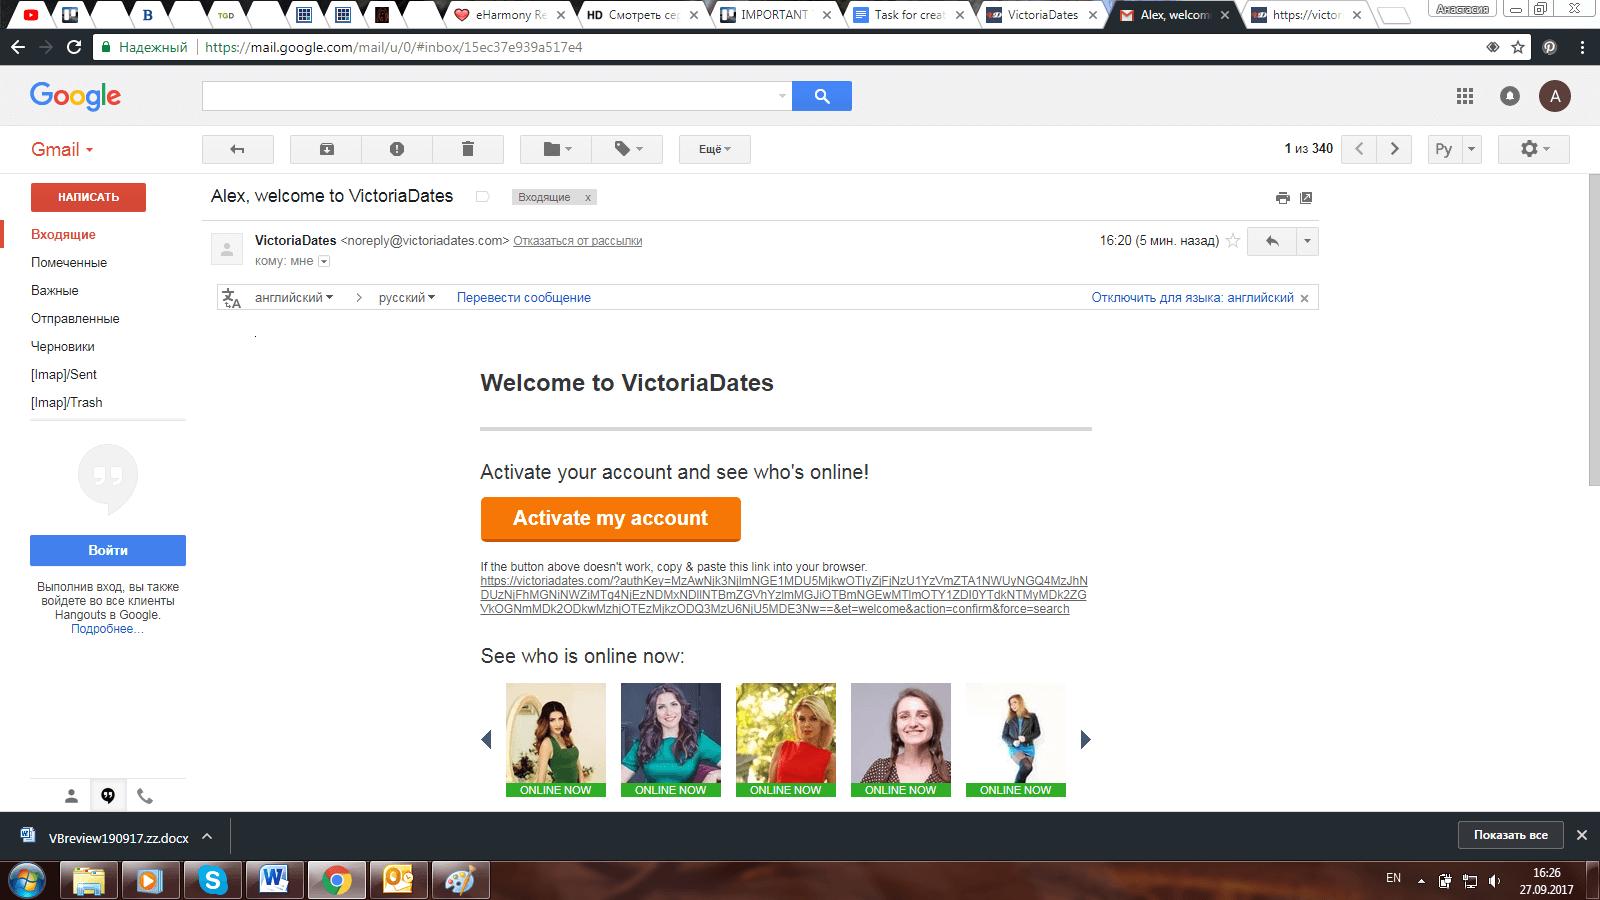 VictoriaDates Account activation